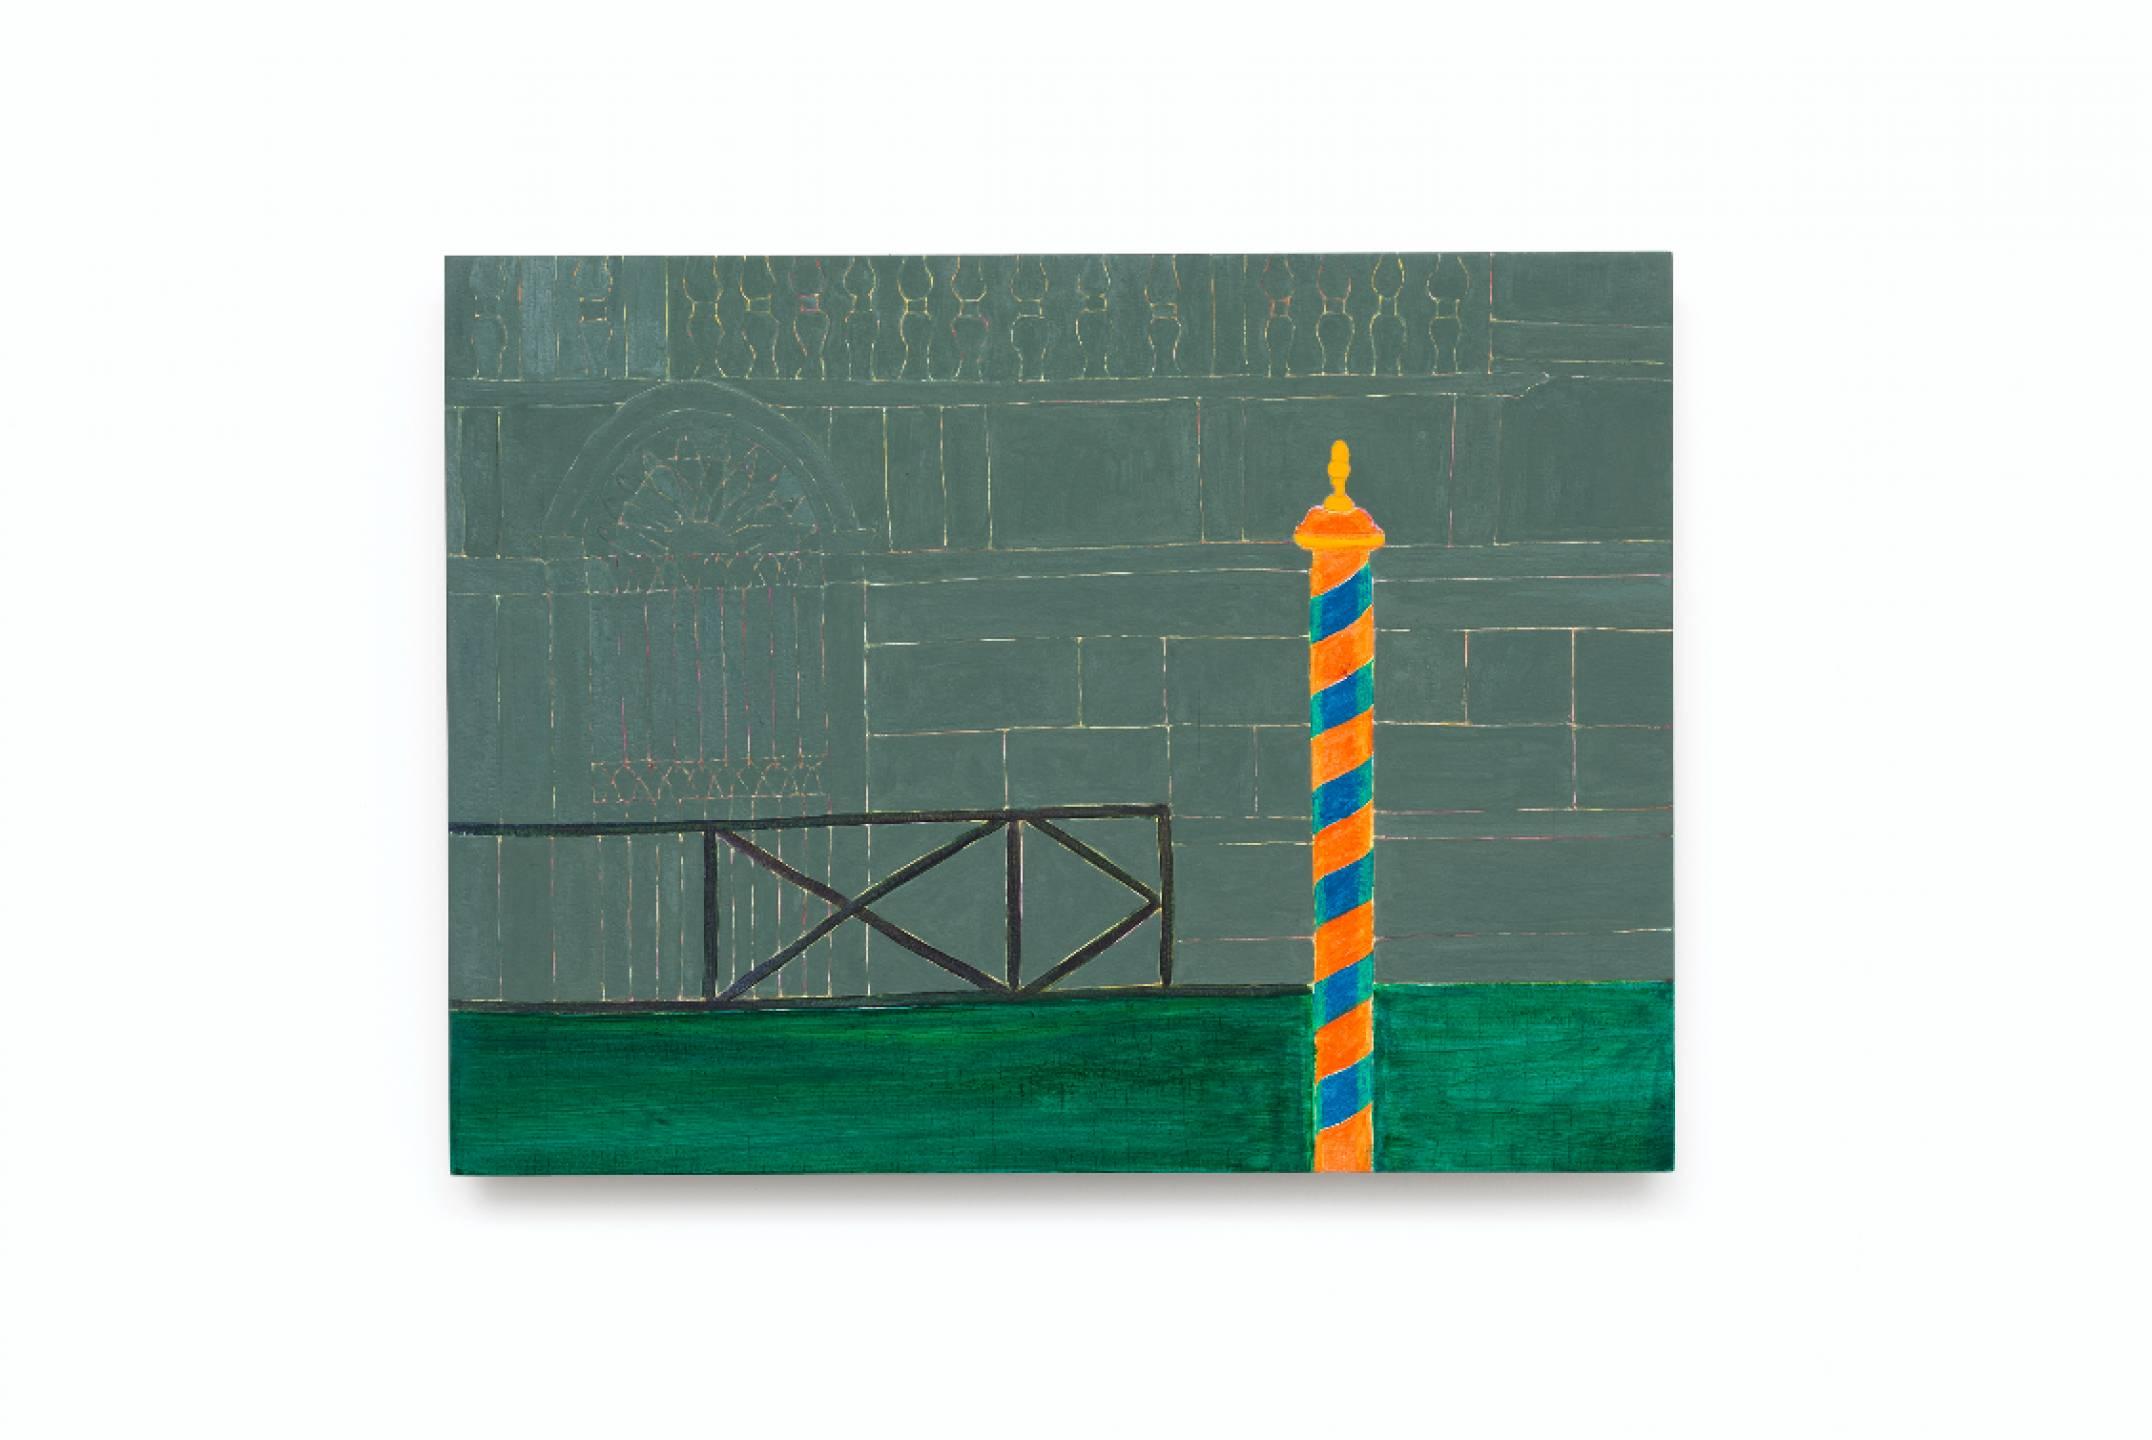 Patricia Leite,<em>untitled, from Veneza series</em>,2015, oil on wood, 30 ×40 cm - Mendes Wood DM